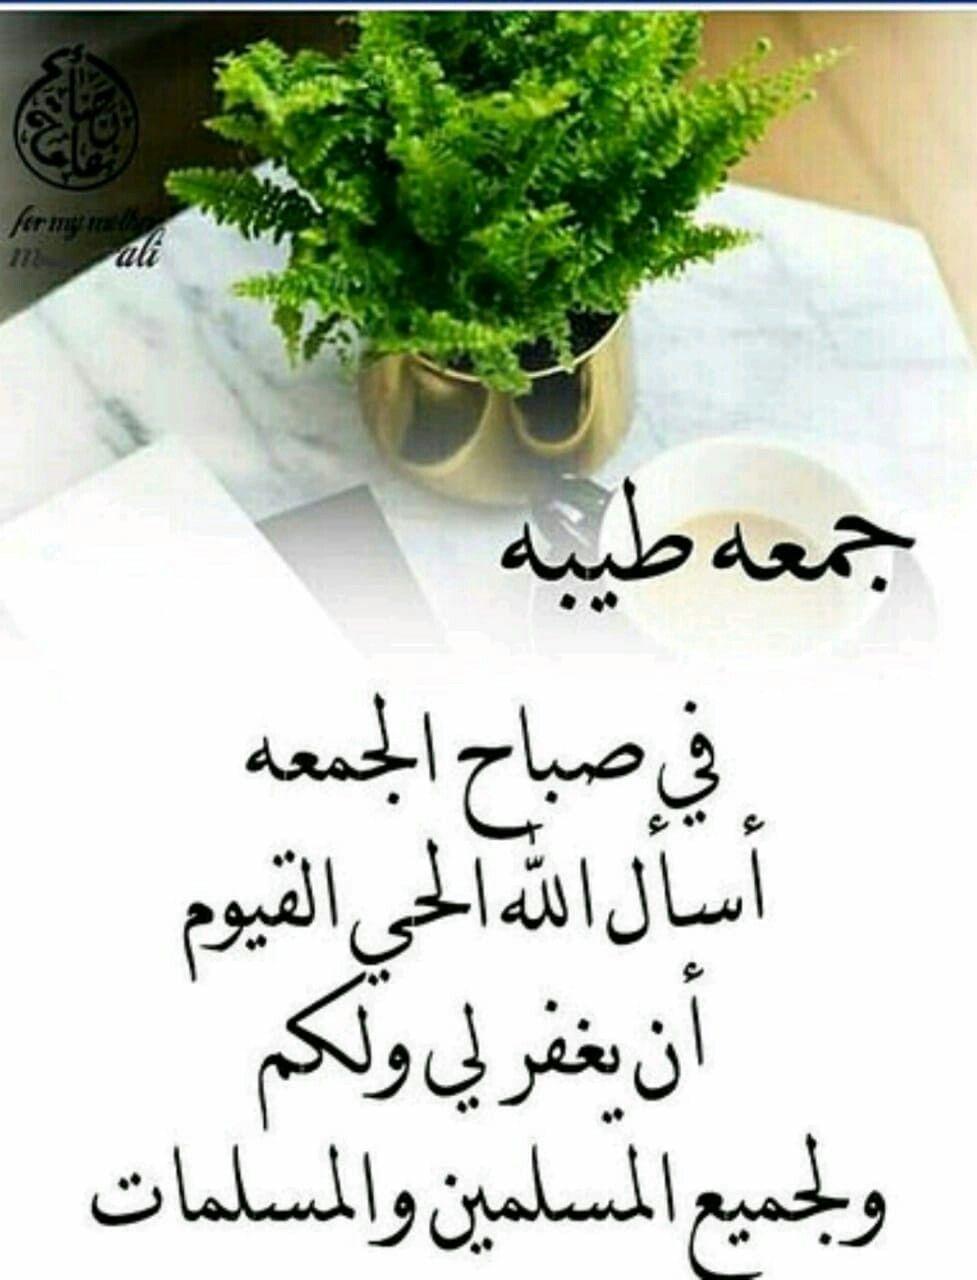 Pin By Naima Nour On الدعاء Juma Mubarak Blessed Friday Arabic Quotes